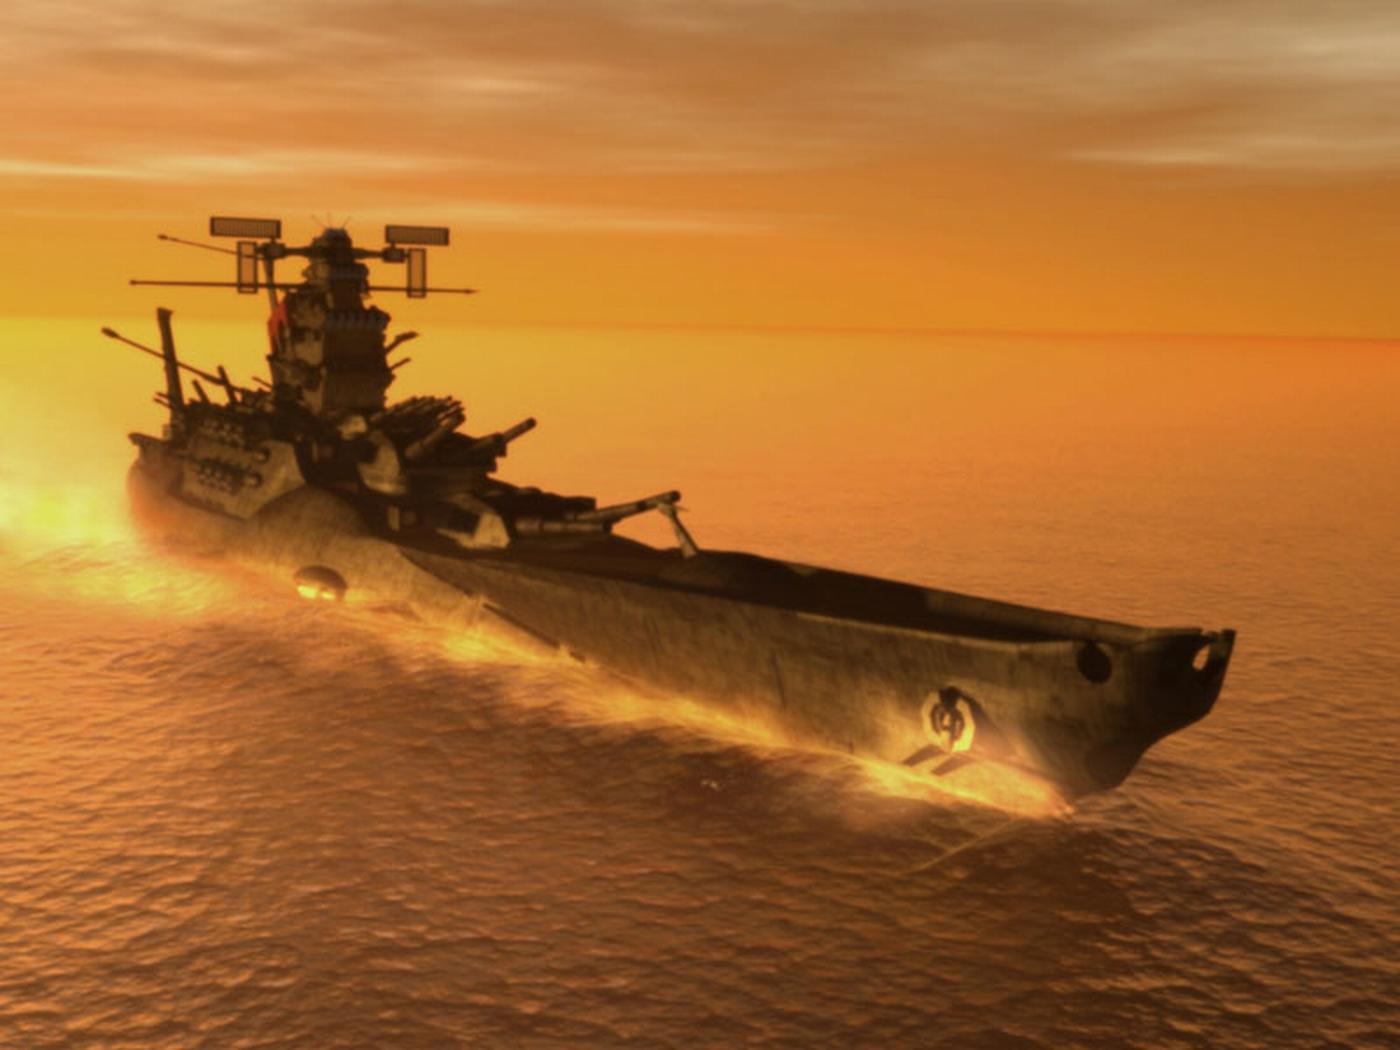 Battleshipyamatowallpaper 1400x1050